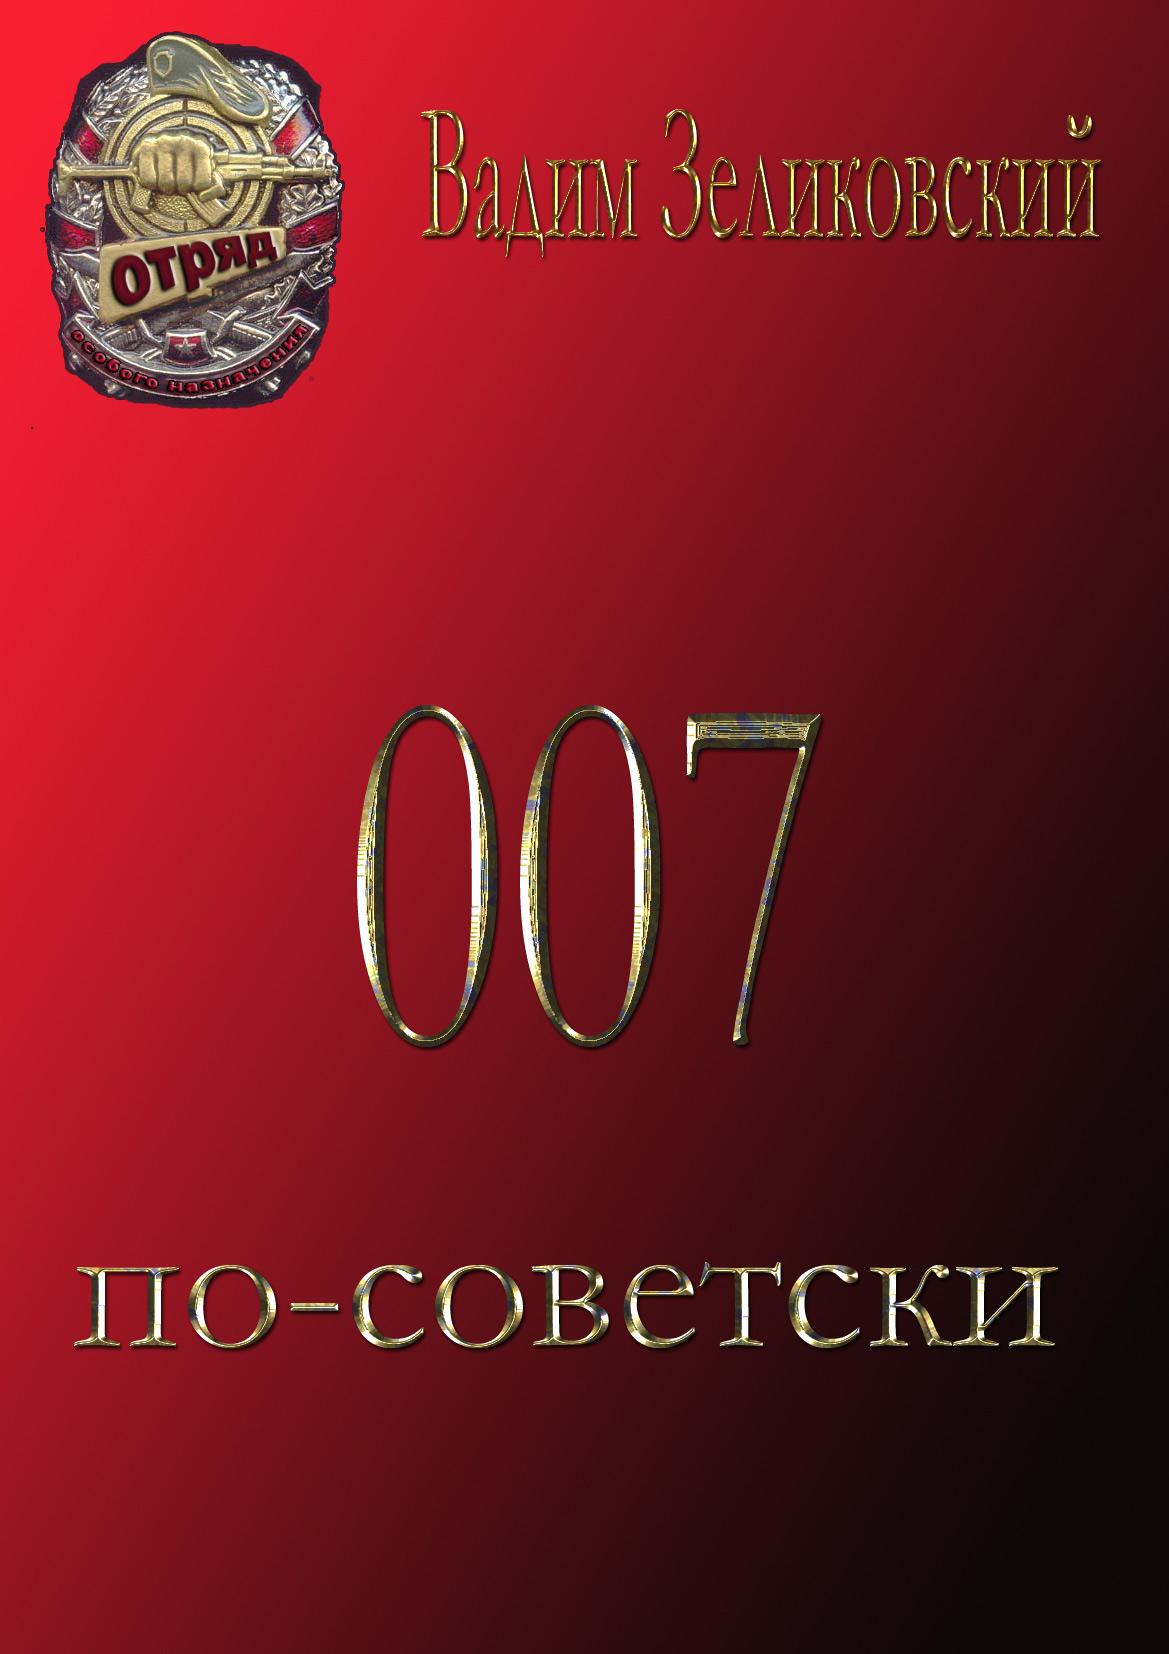 Вадим Зеликовский 007 по-советски цена